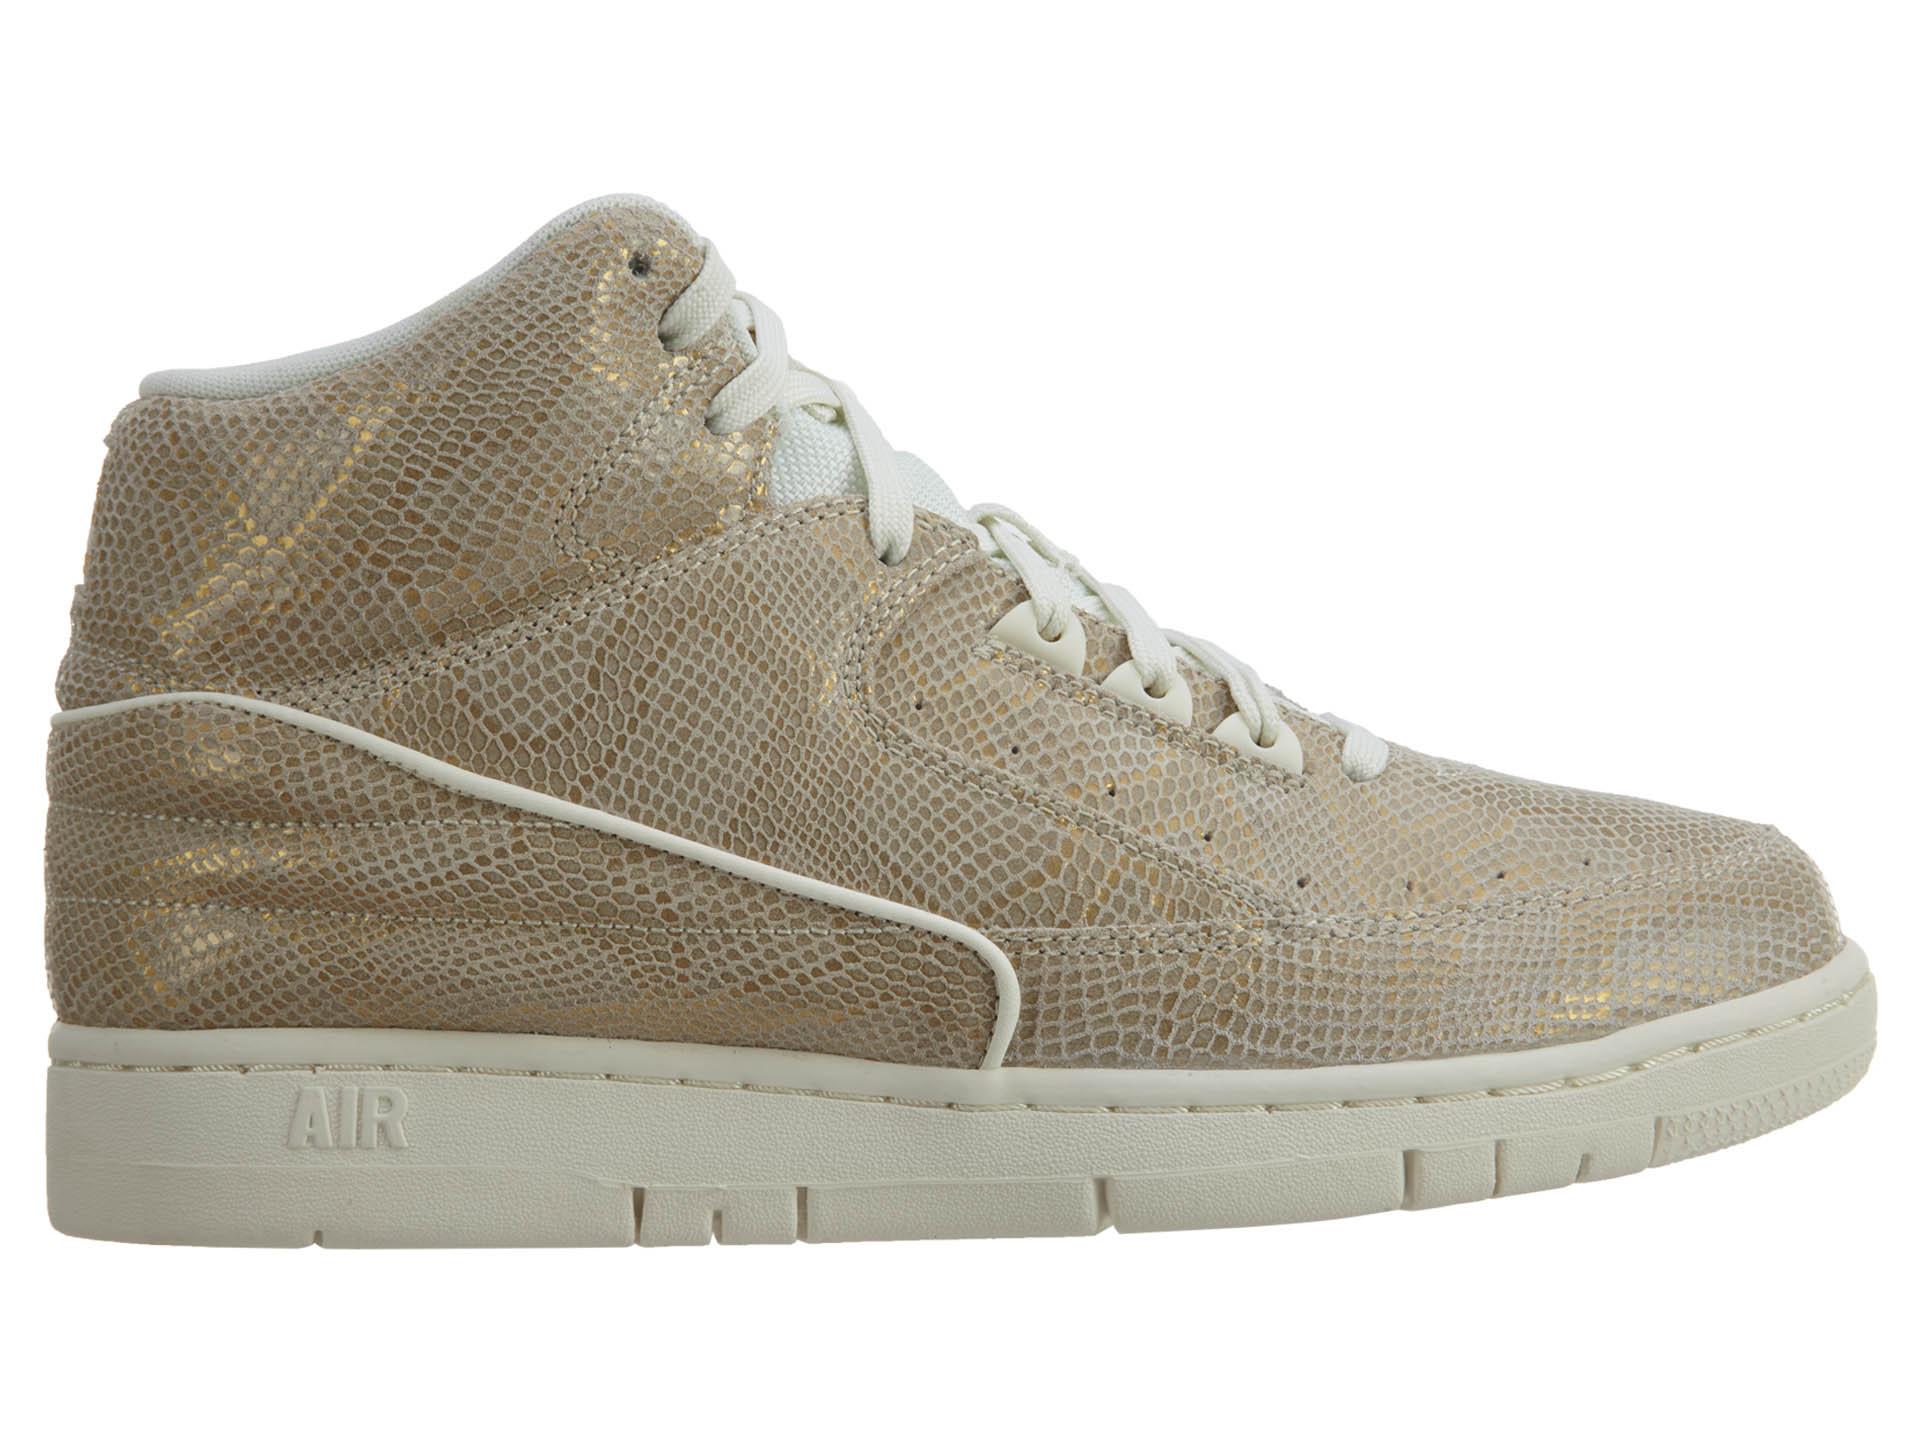 Nike Air Python Prm Sail/Metallic Gold